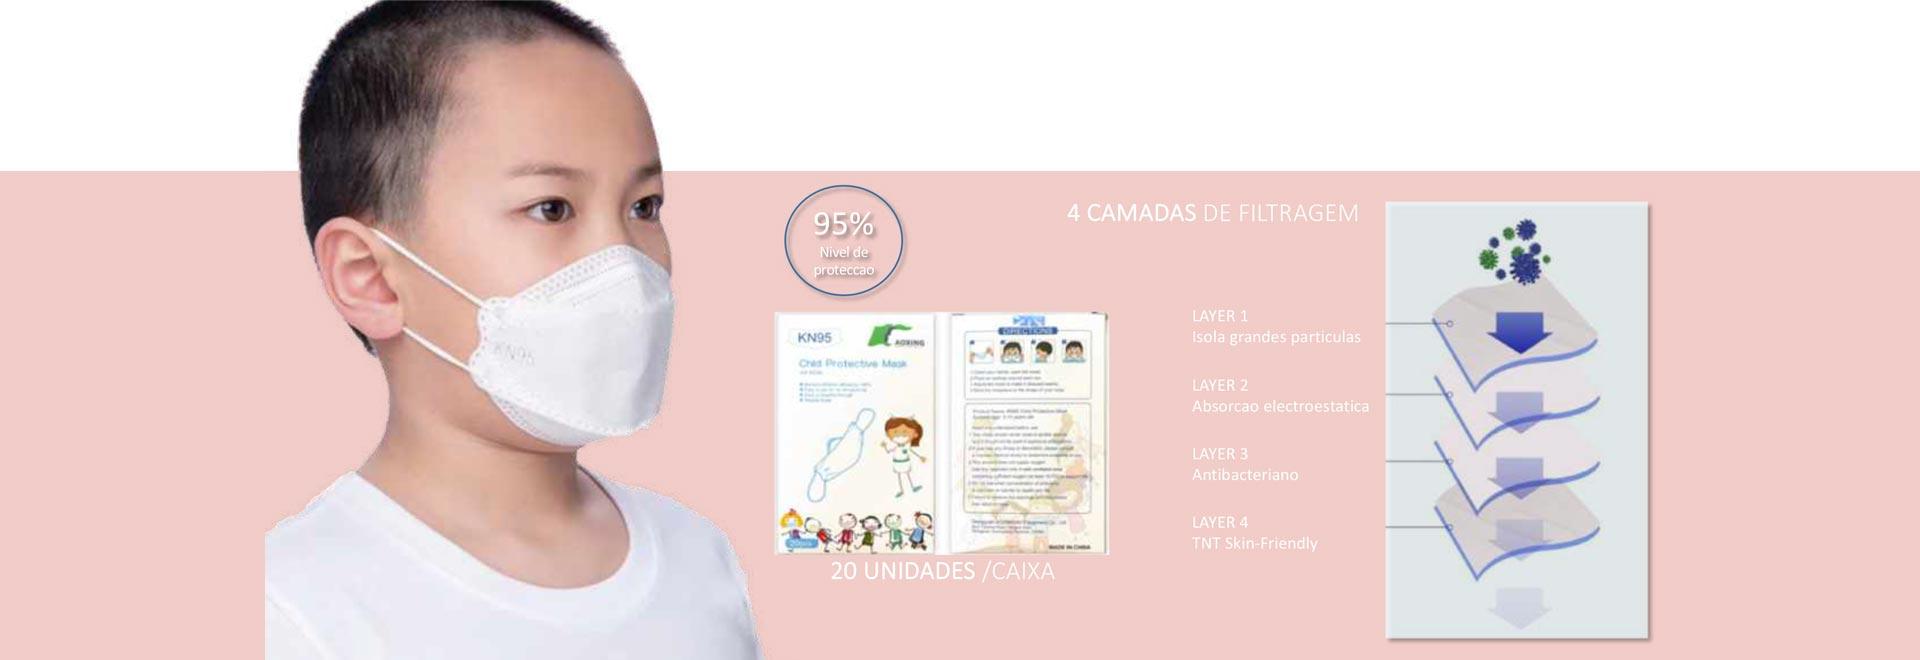 RESPIRADOR DE PROTECCAO KN95 (FFP2) KIDS